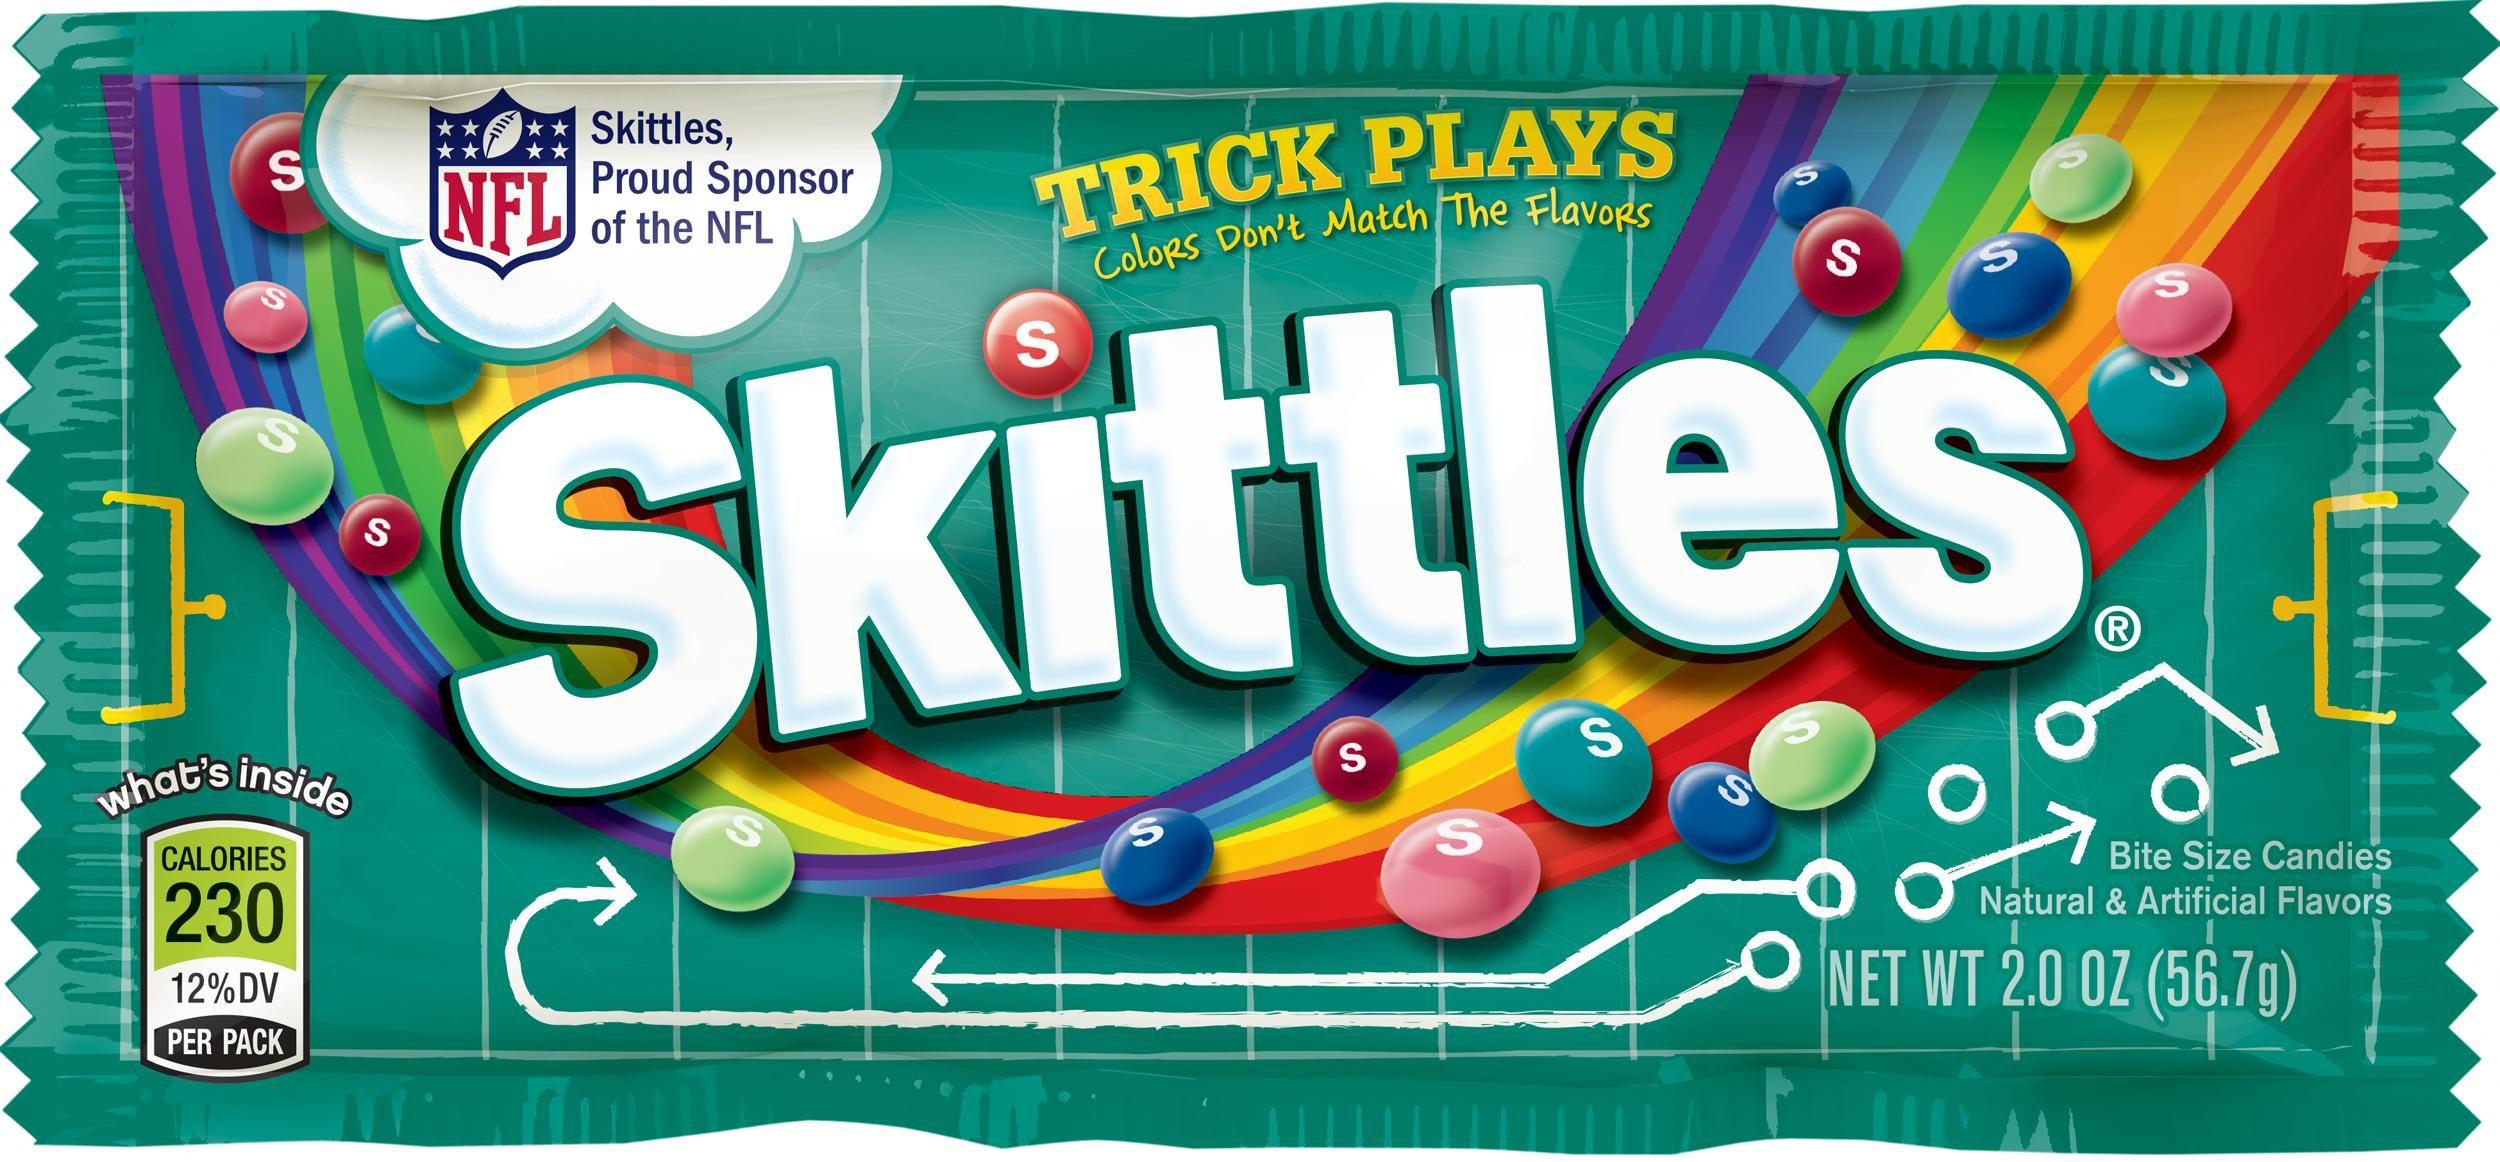 i want skittles